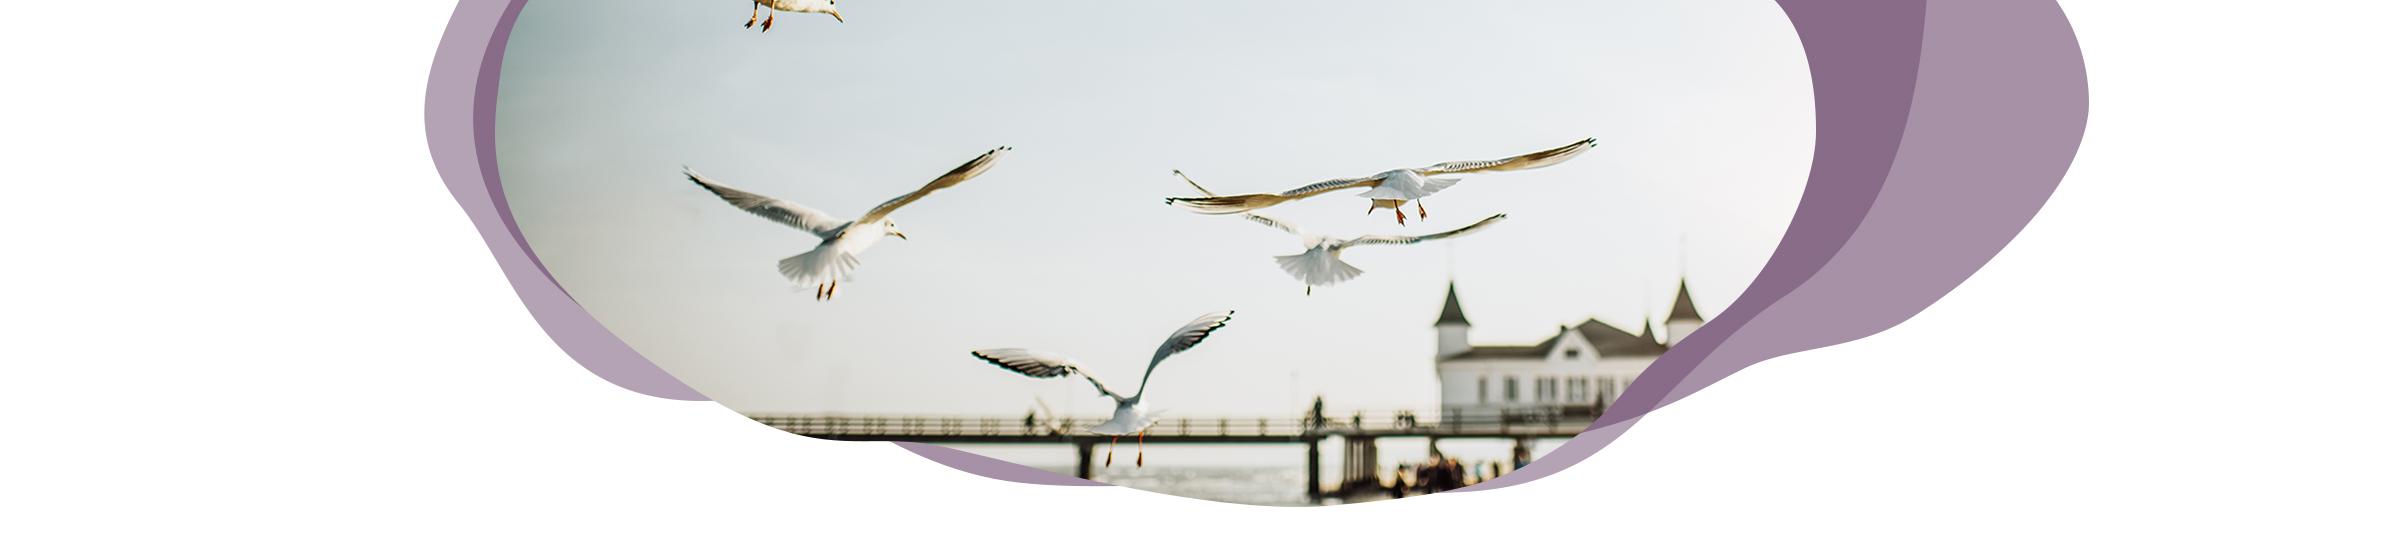 Digitale Reise Mecklenburg-Vorpommern Header